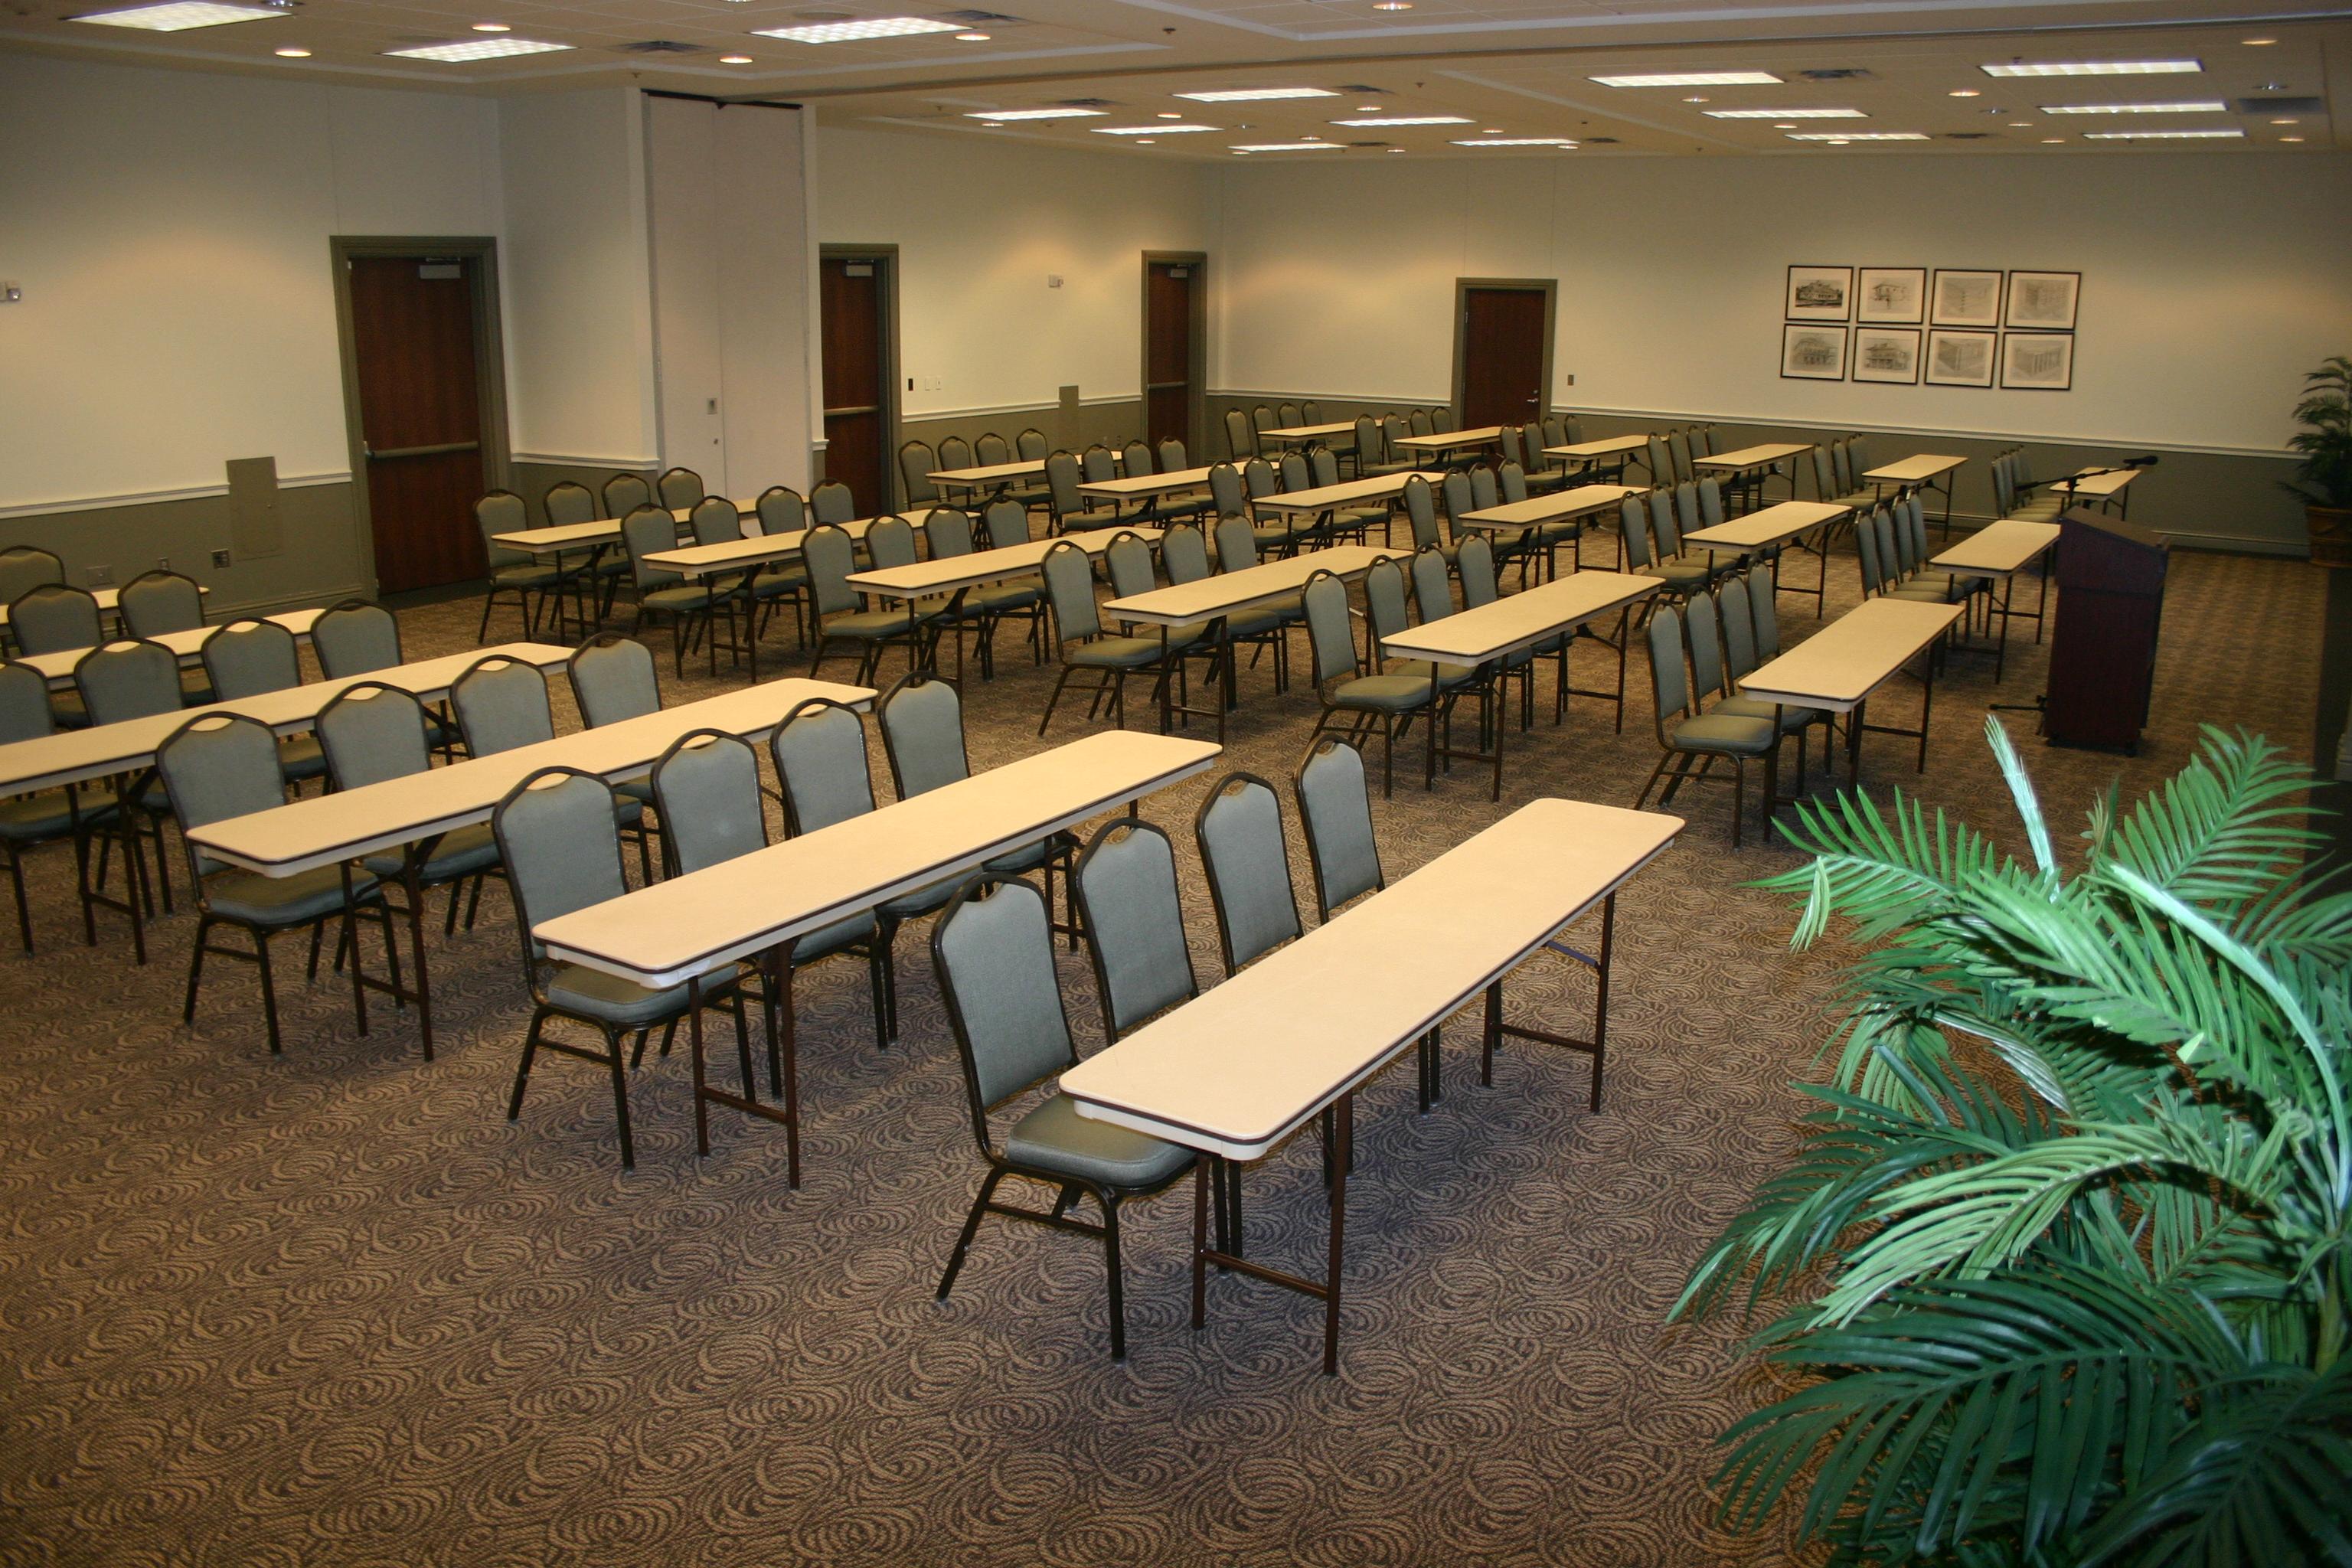 Oakland & Magnolia Rooms - Classroom Style